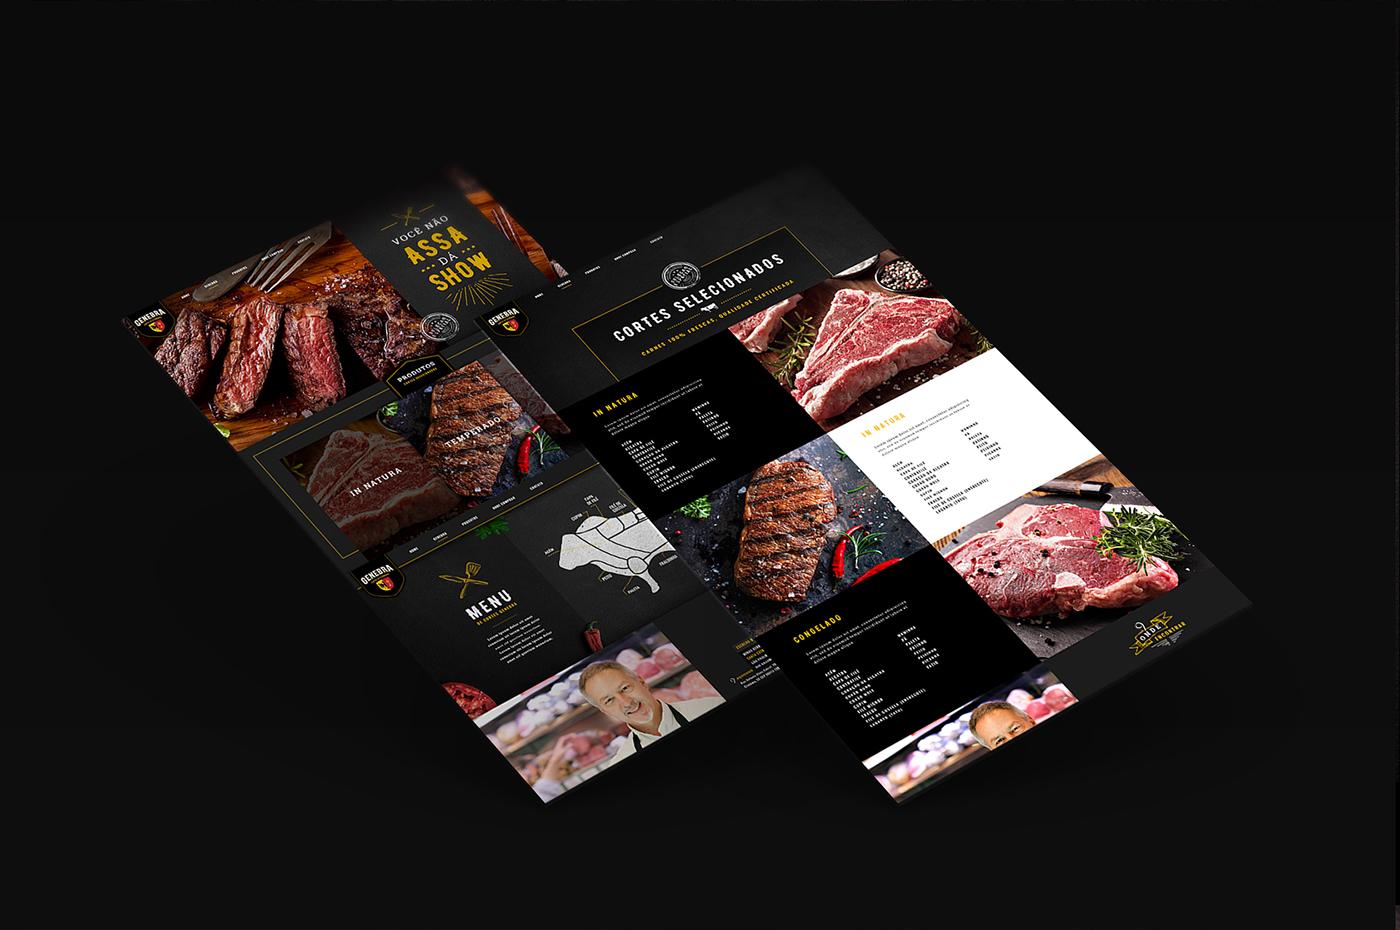 genebra BBQ steak churrasco Frigorífico carne beef meat Geneva